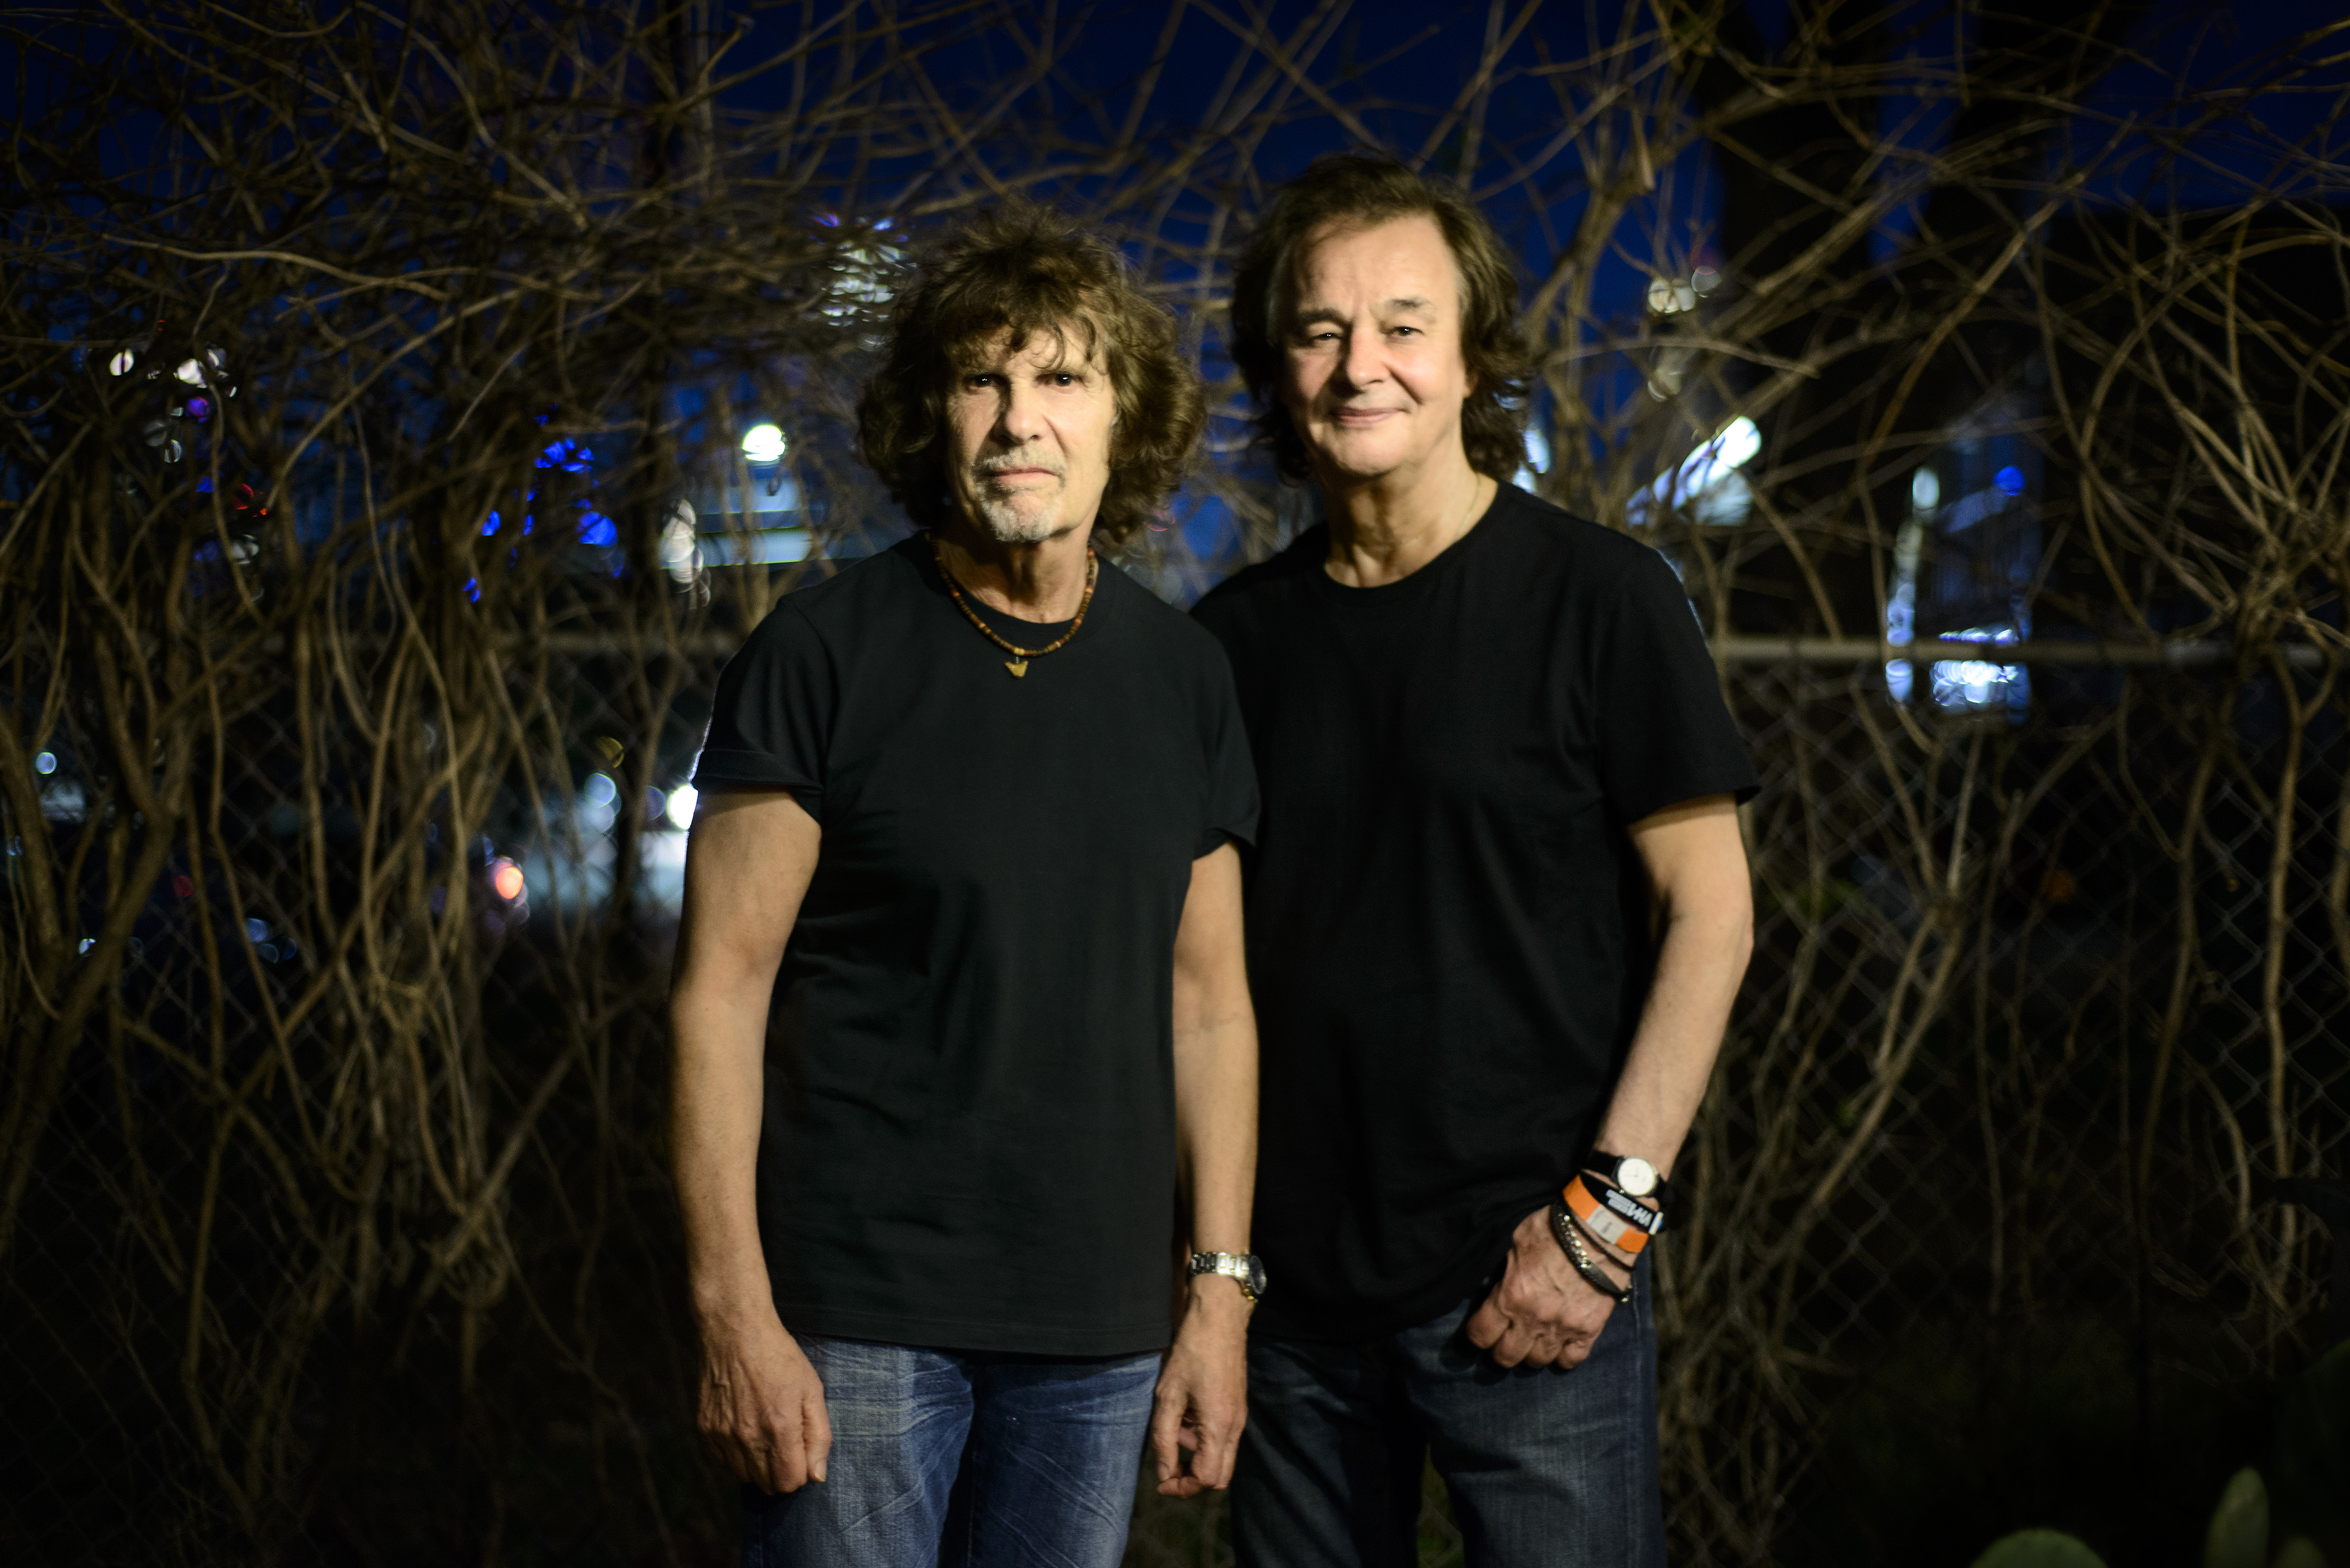 Colin & Rod at SXSW (credit Jacob Blickenstaff)